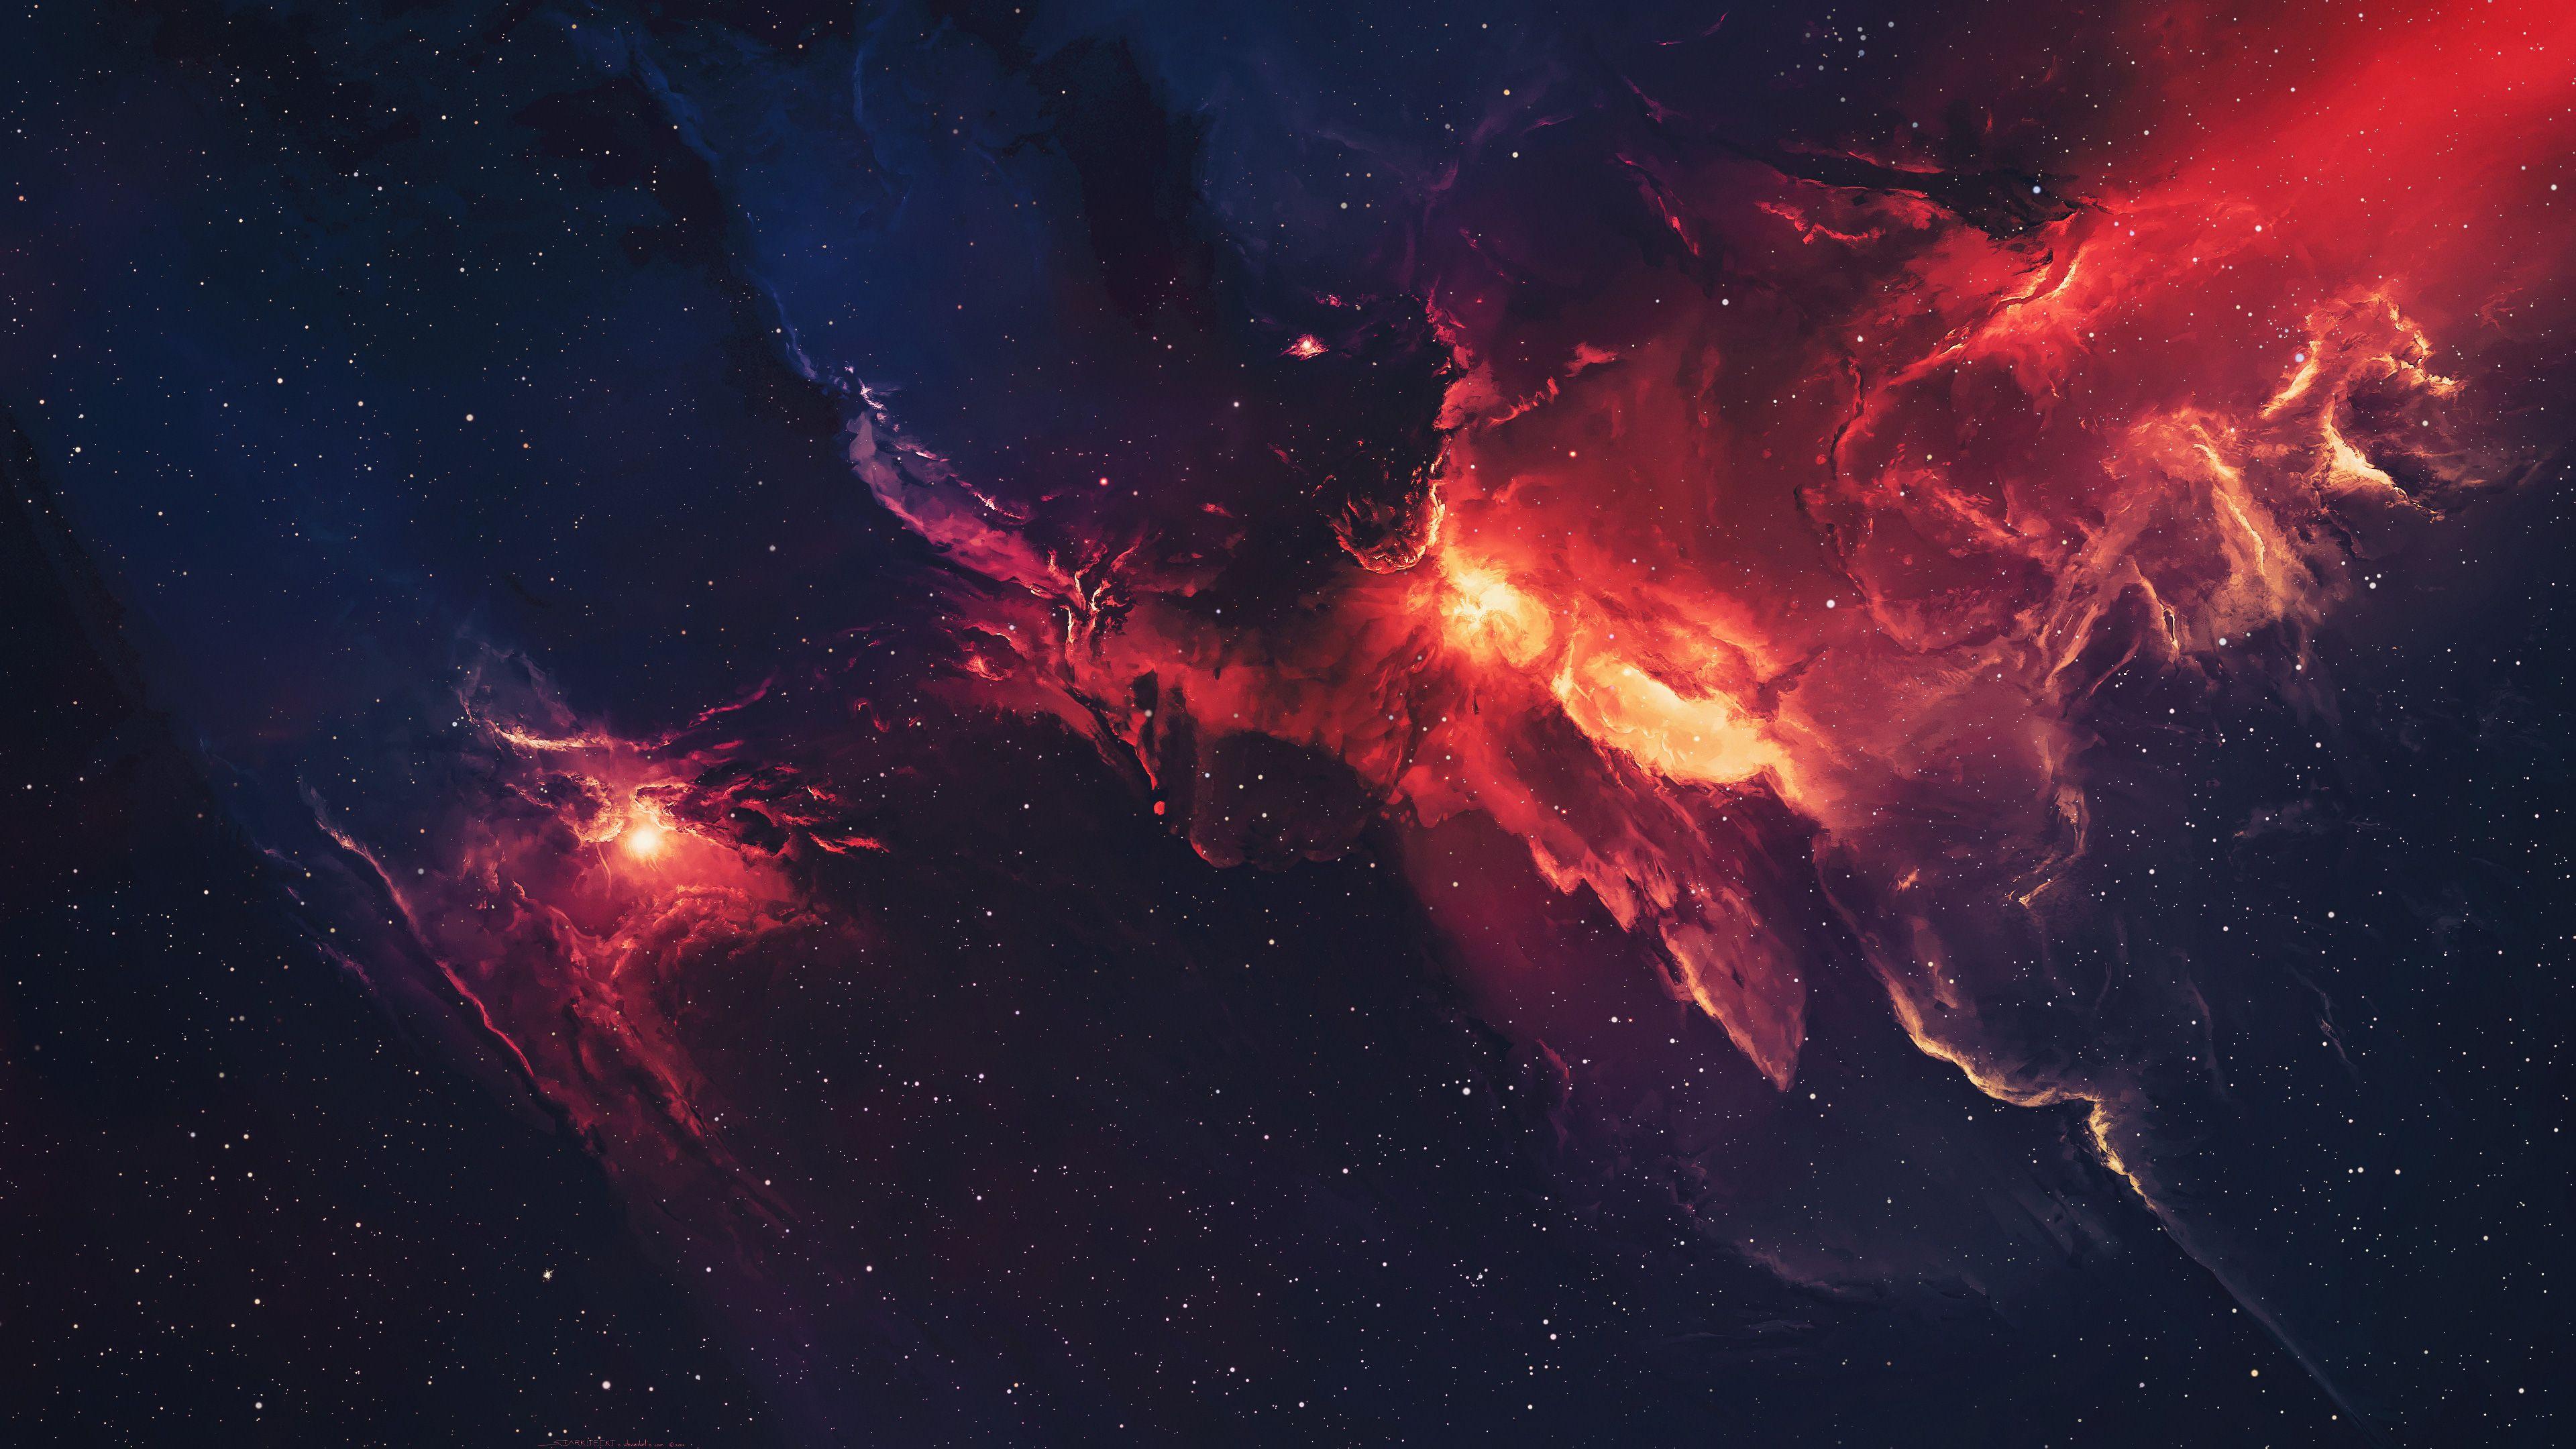 Wallpaper 4k Galaxy Space Stars Universe Nebula 4k 4k